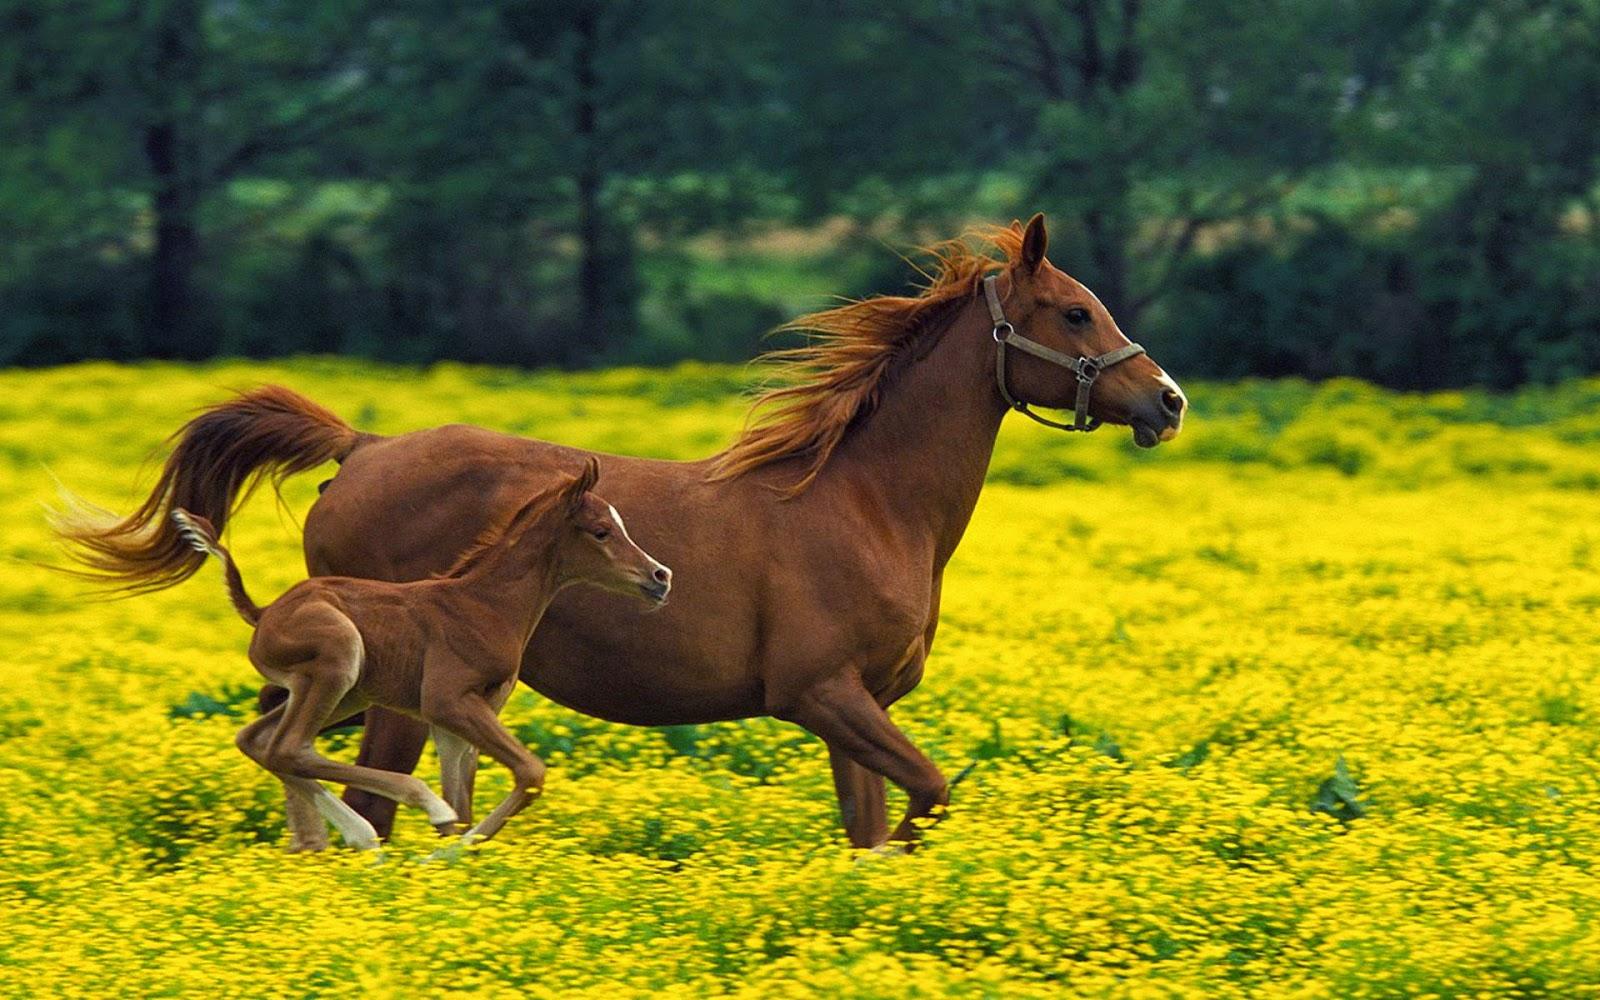 Wonderful   Wallpaper Horse Samsung Galaxy - Horse%2BHD%2BWallpapers%2B(10)  Perfect Image Reference_69532.jpg